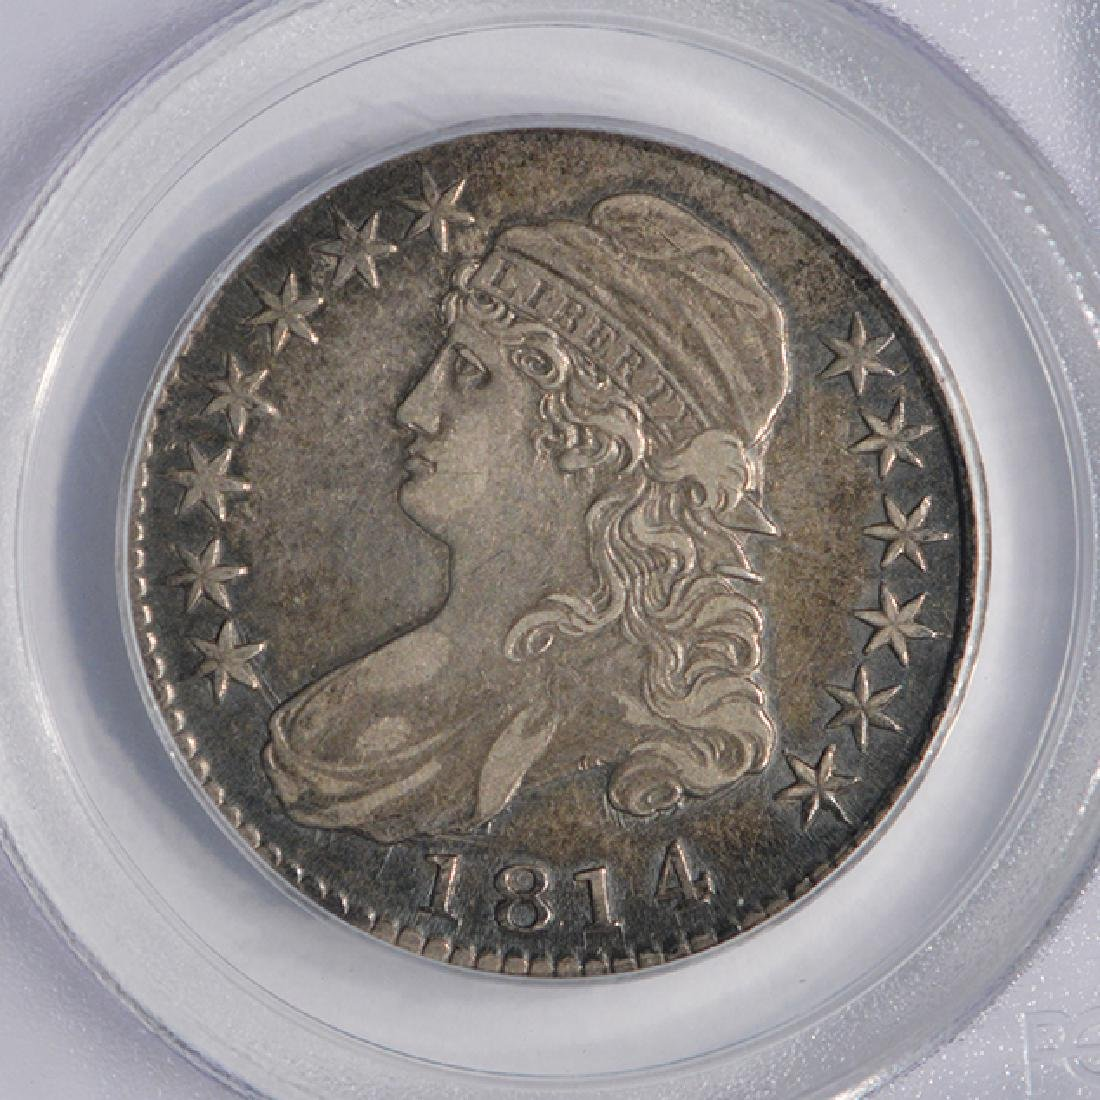 1814 Capped Bust Half Dollar Coin PCGS XF40 - 3